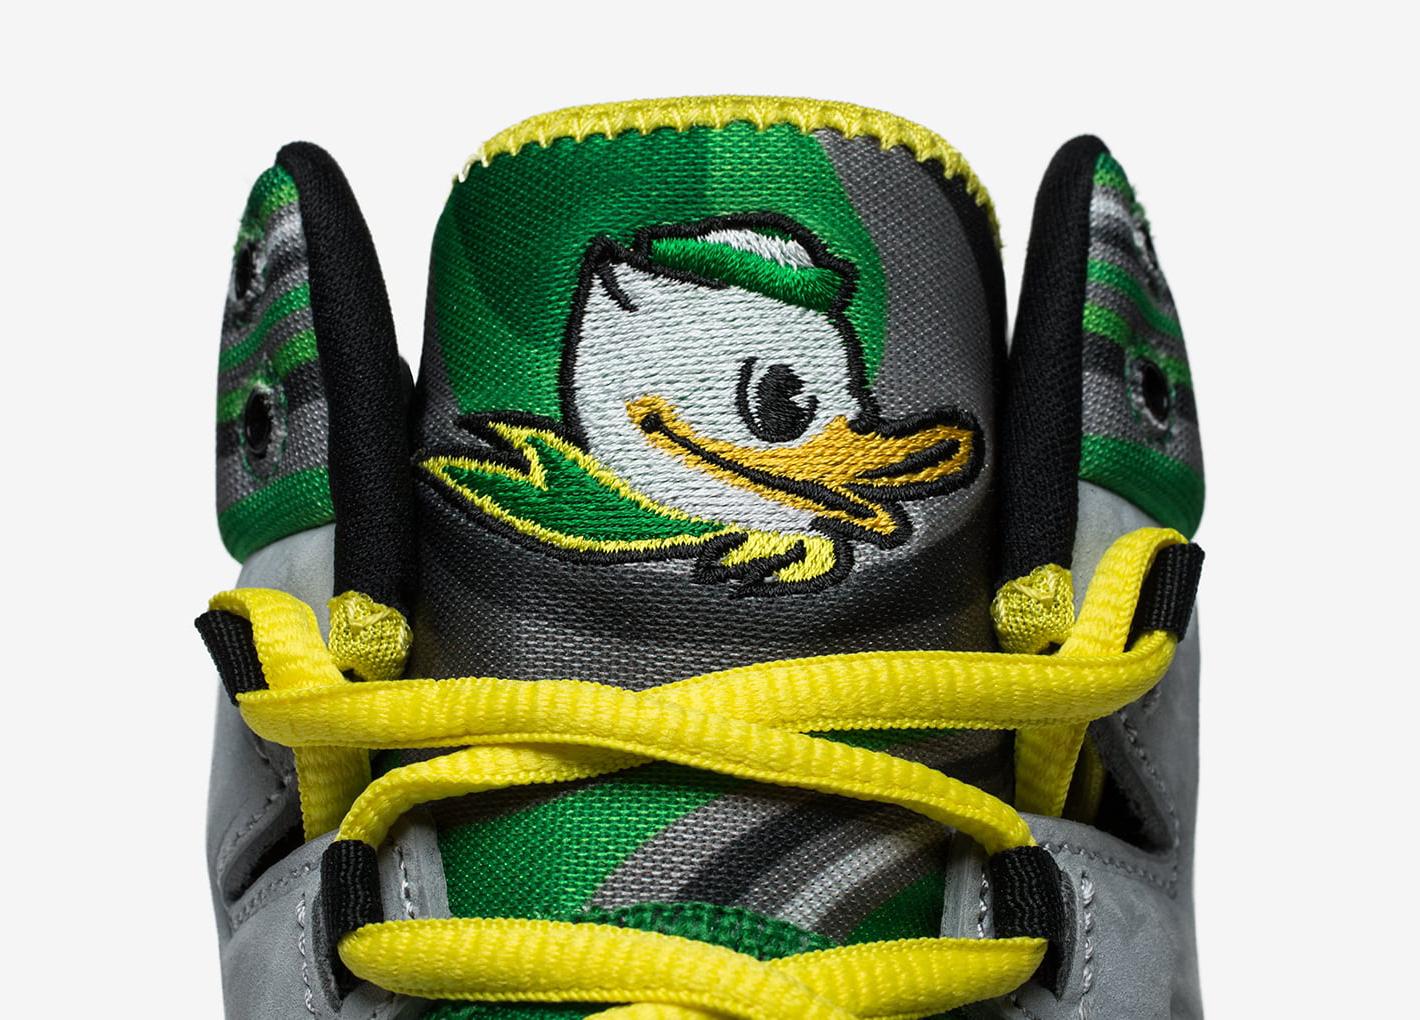 6eb55daff155 Oregon Ducks Air Jordan Melo M10 Tongue